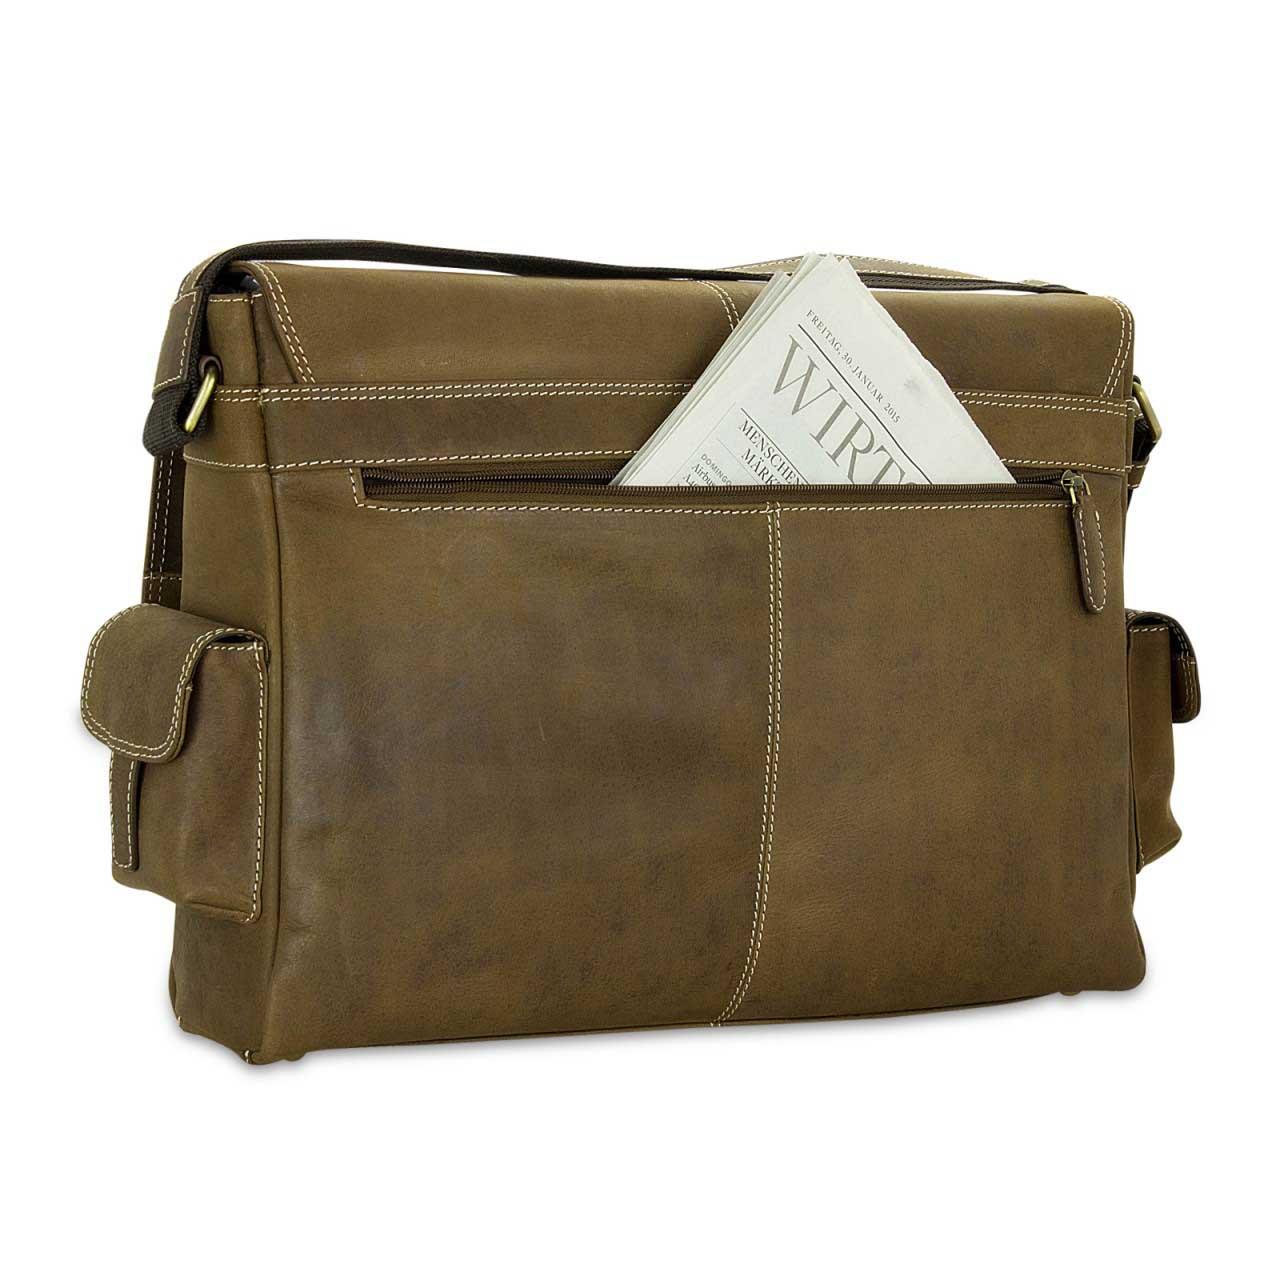 STILORD Ledertasche Umhängetasche 15.6 Zoll Laptoptasche aus echtem Büffel-Leder braun  - Bild 8